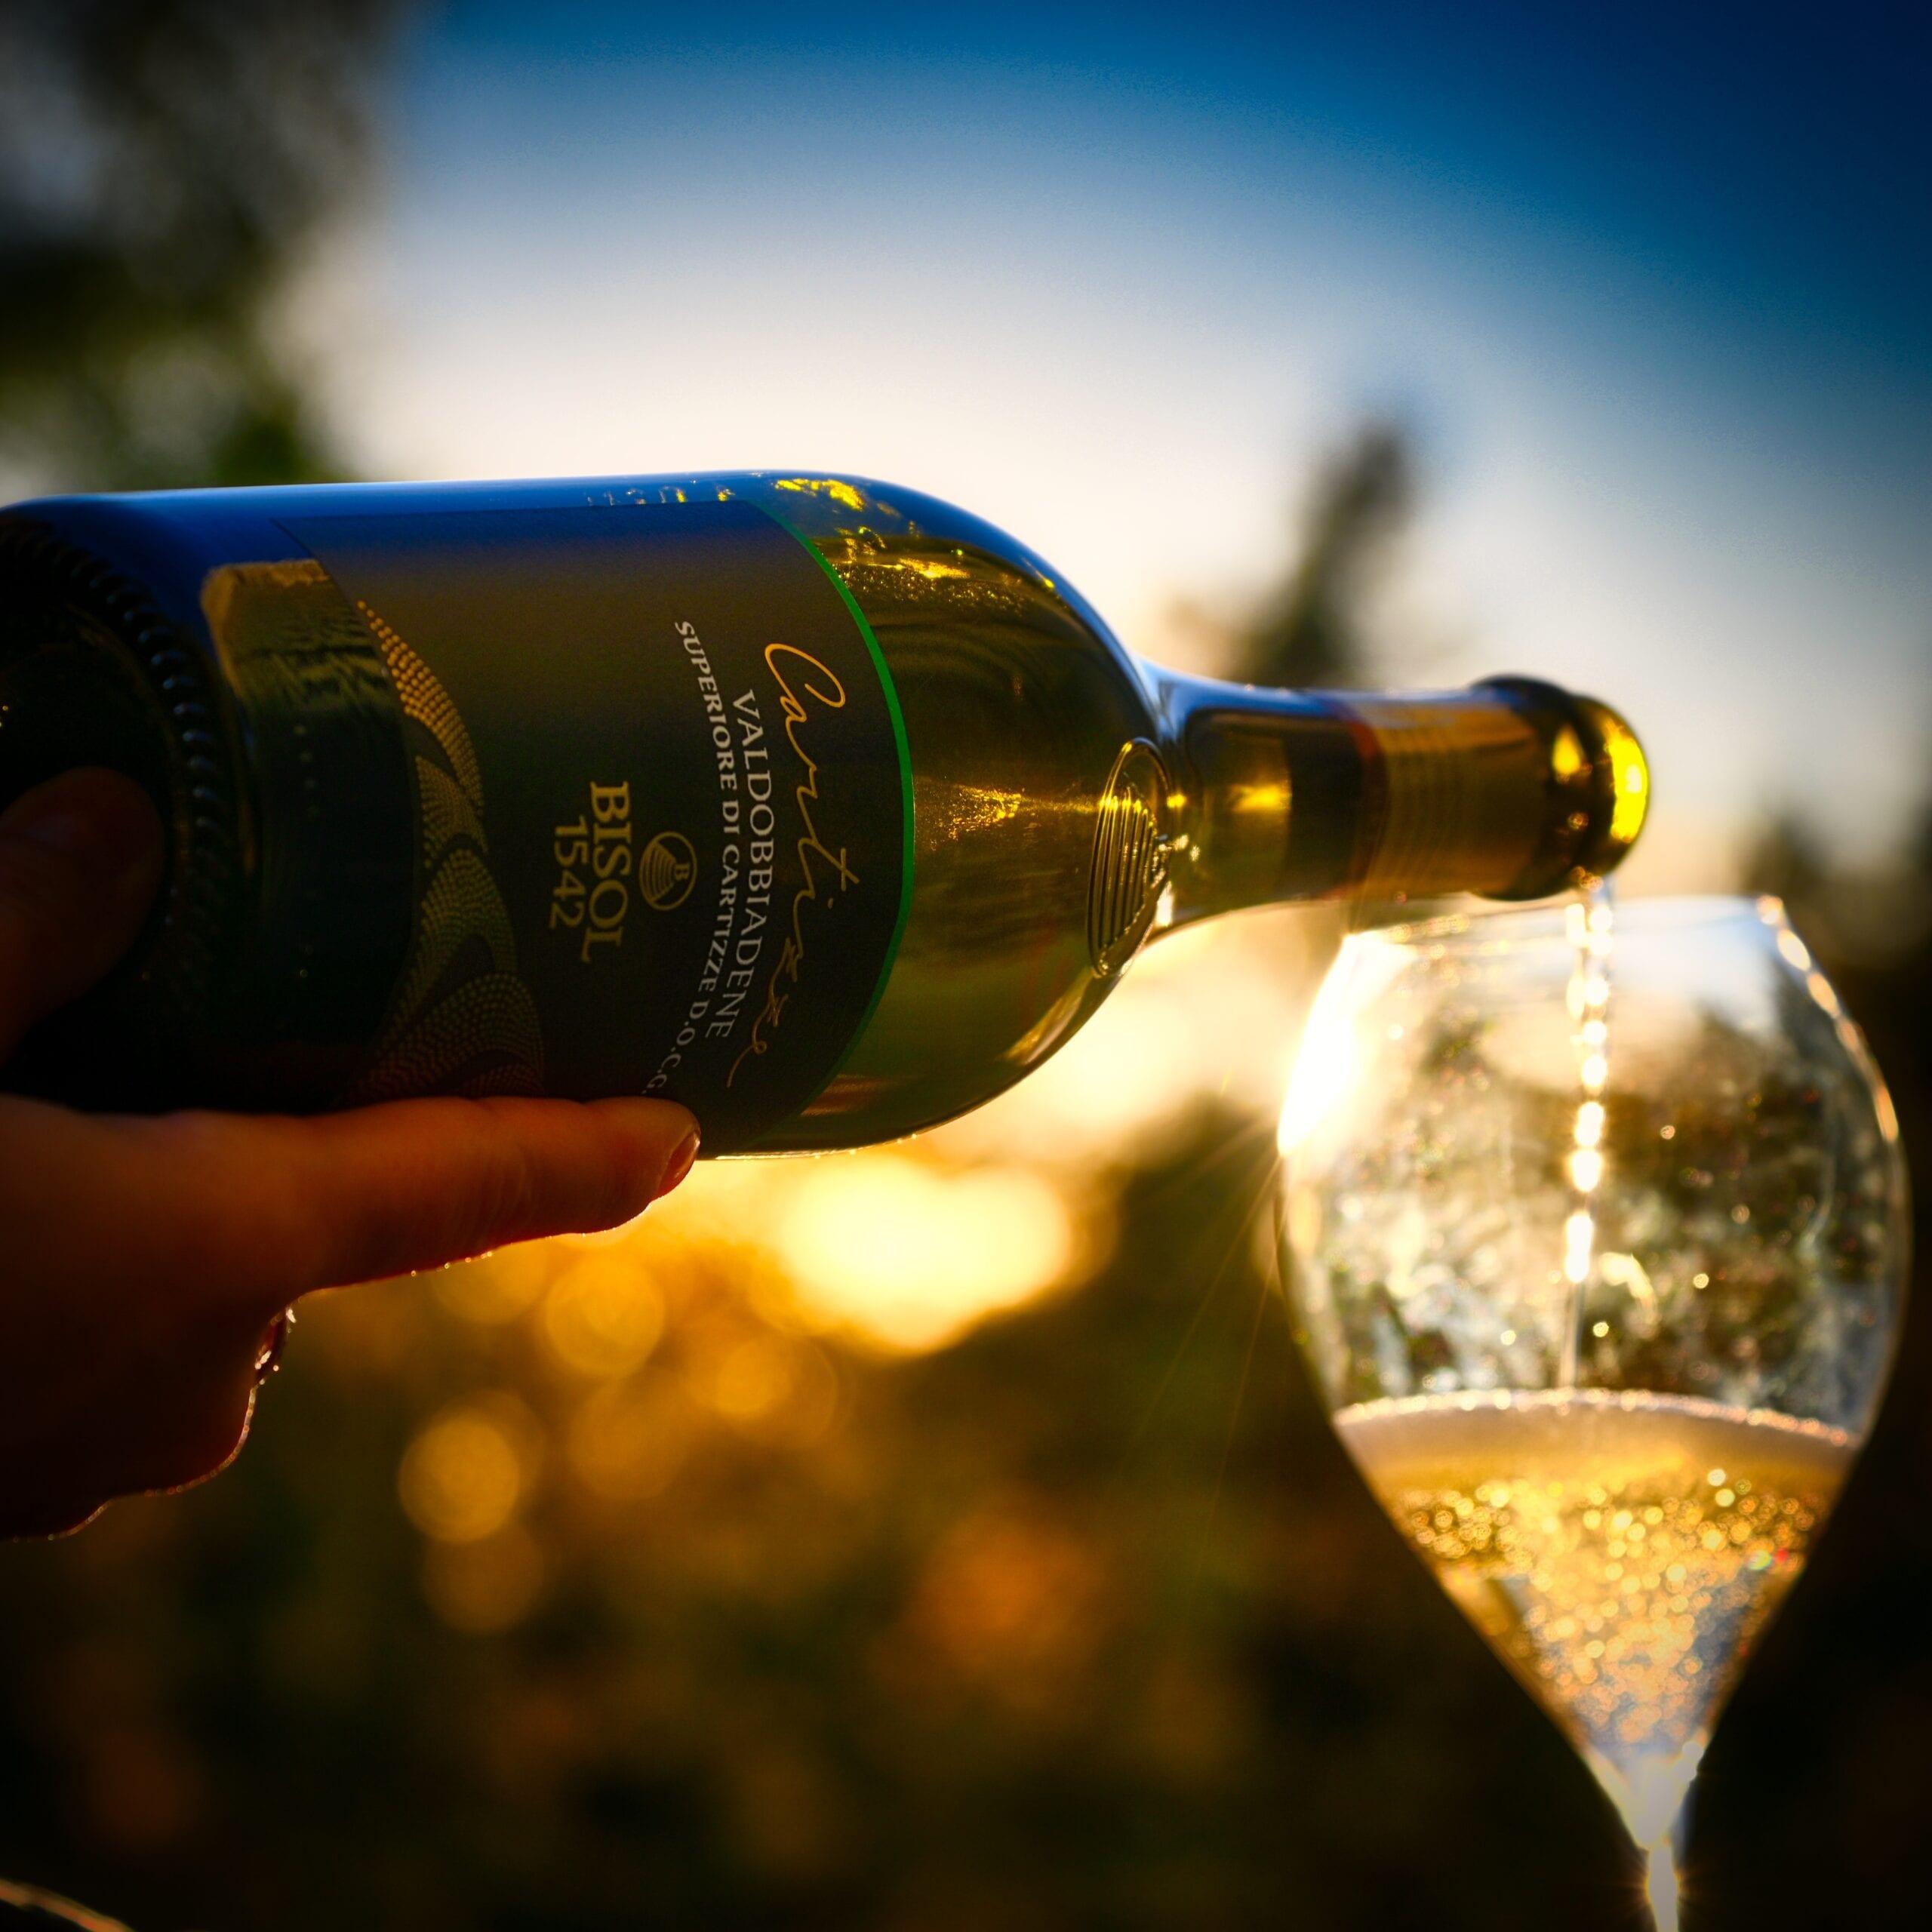 Clotilde Davenne Brut Extra Crémant de Bourgogne